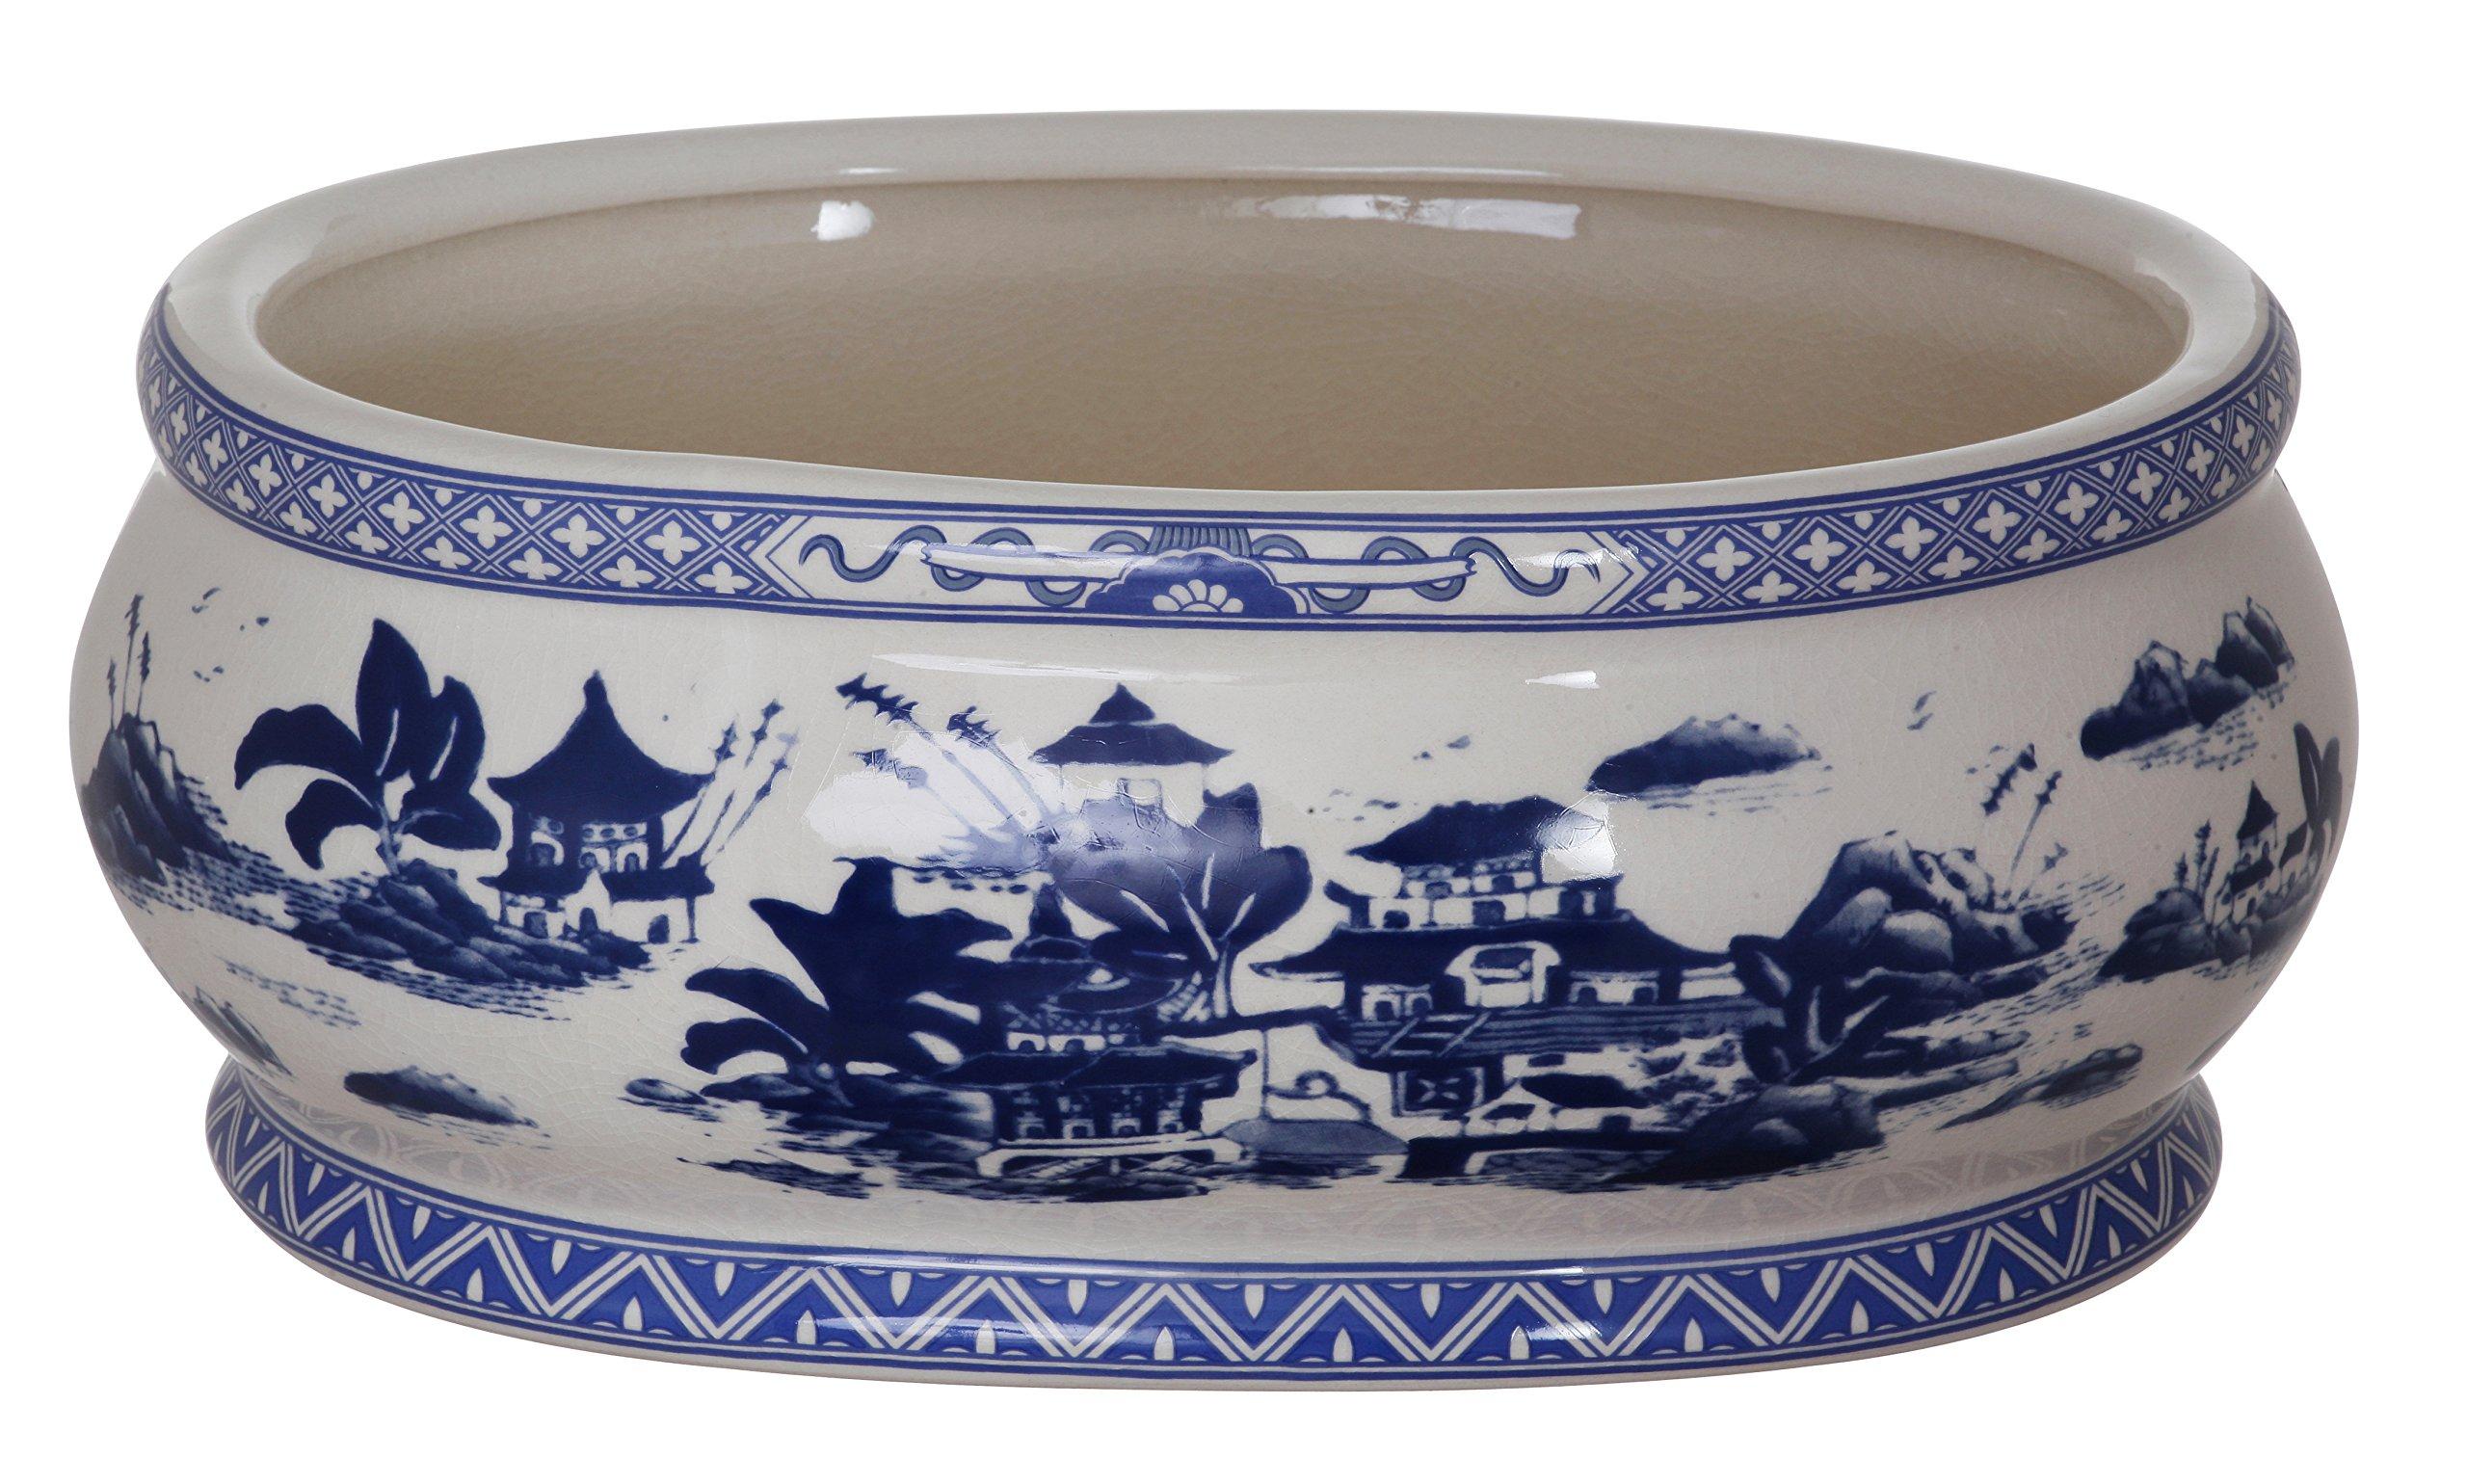 Winward Silks China Village Oval Planter, 14.5-Inch Wide, Blue by Winward Designs